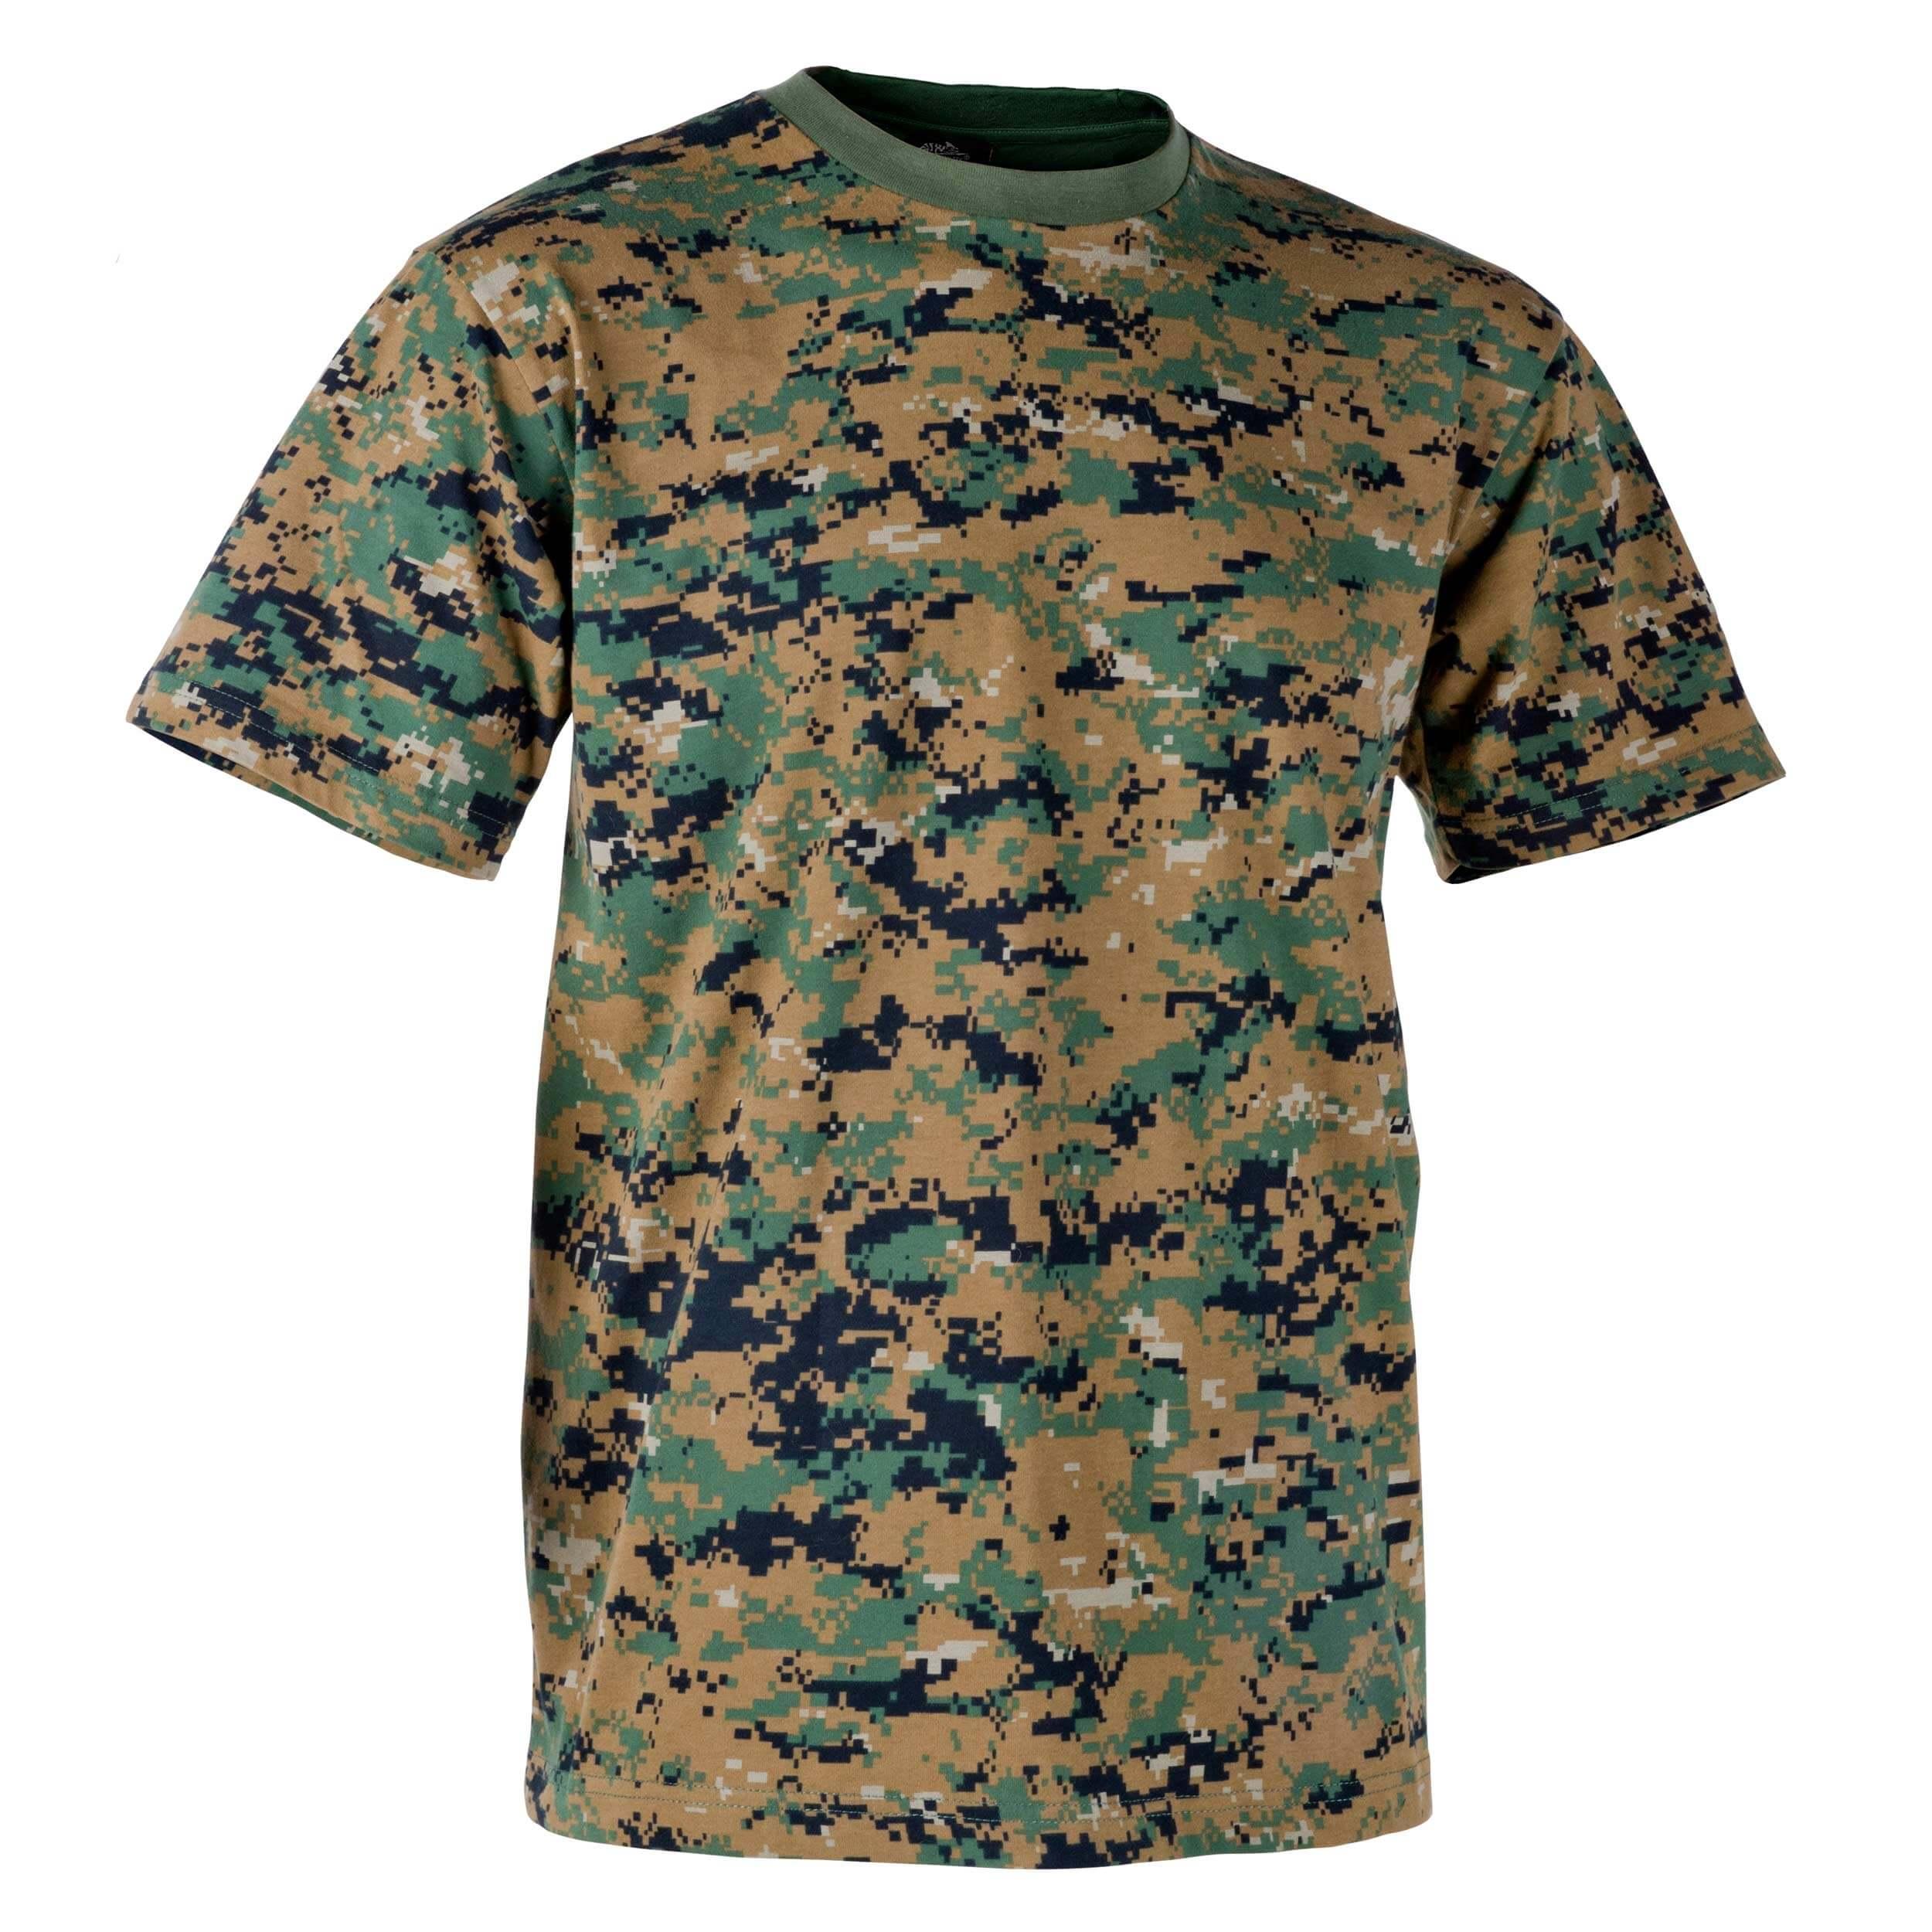 Helikon-Tex Classic Army T-Shirt USMC Digital Woodland